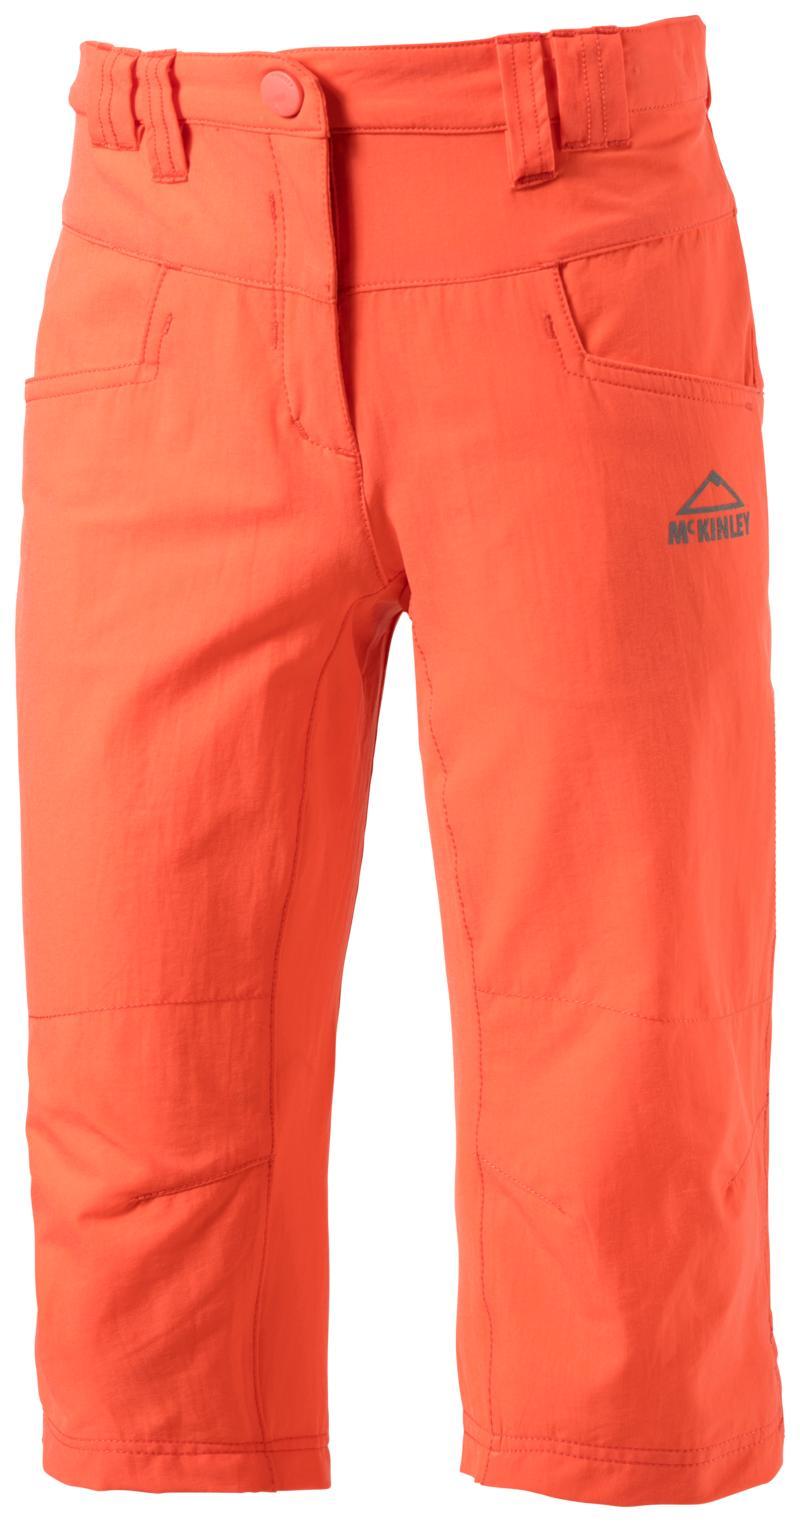 McKinley SARI GLS, hlače, crvena